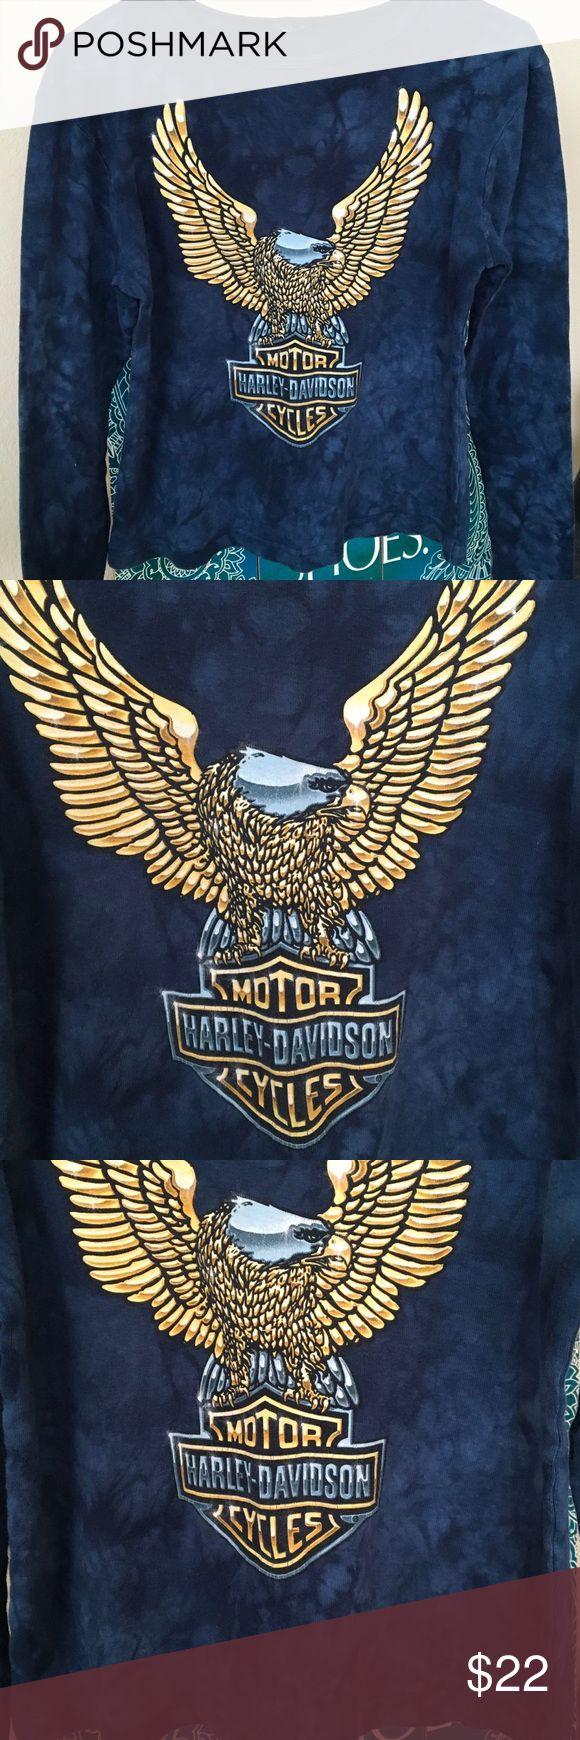 "HARLEY DAVIDSON BLUE TIe Dye cotton MOTOR CYCLES S BLue tie dye Long sleeved round neck Harley ladies shirt. large eagle MOTOR CYCLES HARLEY- DAVIDSON on front.... Back reads GRAND Canyon HARLEY -DAVIDSON Prescott Arizona. Small 17 3/4"" UA - UA .......20 3/4"" T- B Harley-Davidson Tops Tees - Long Sleeve"